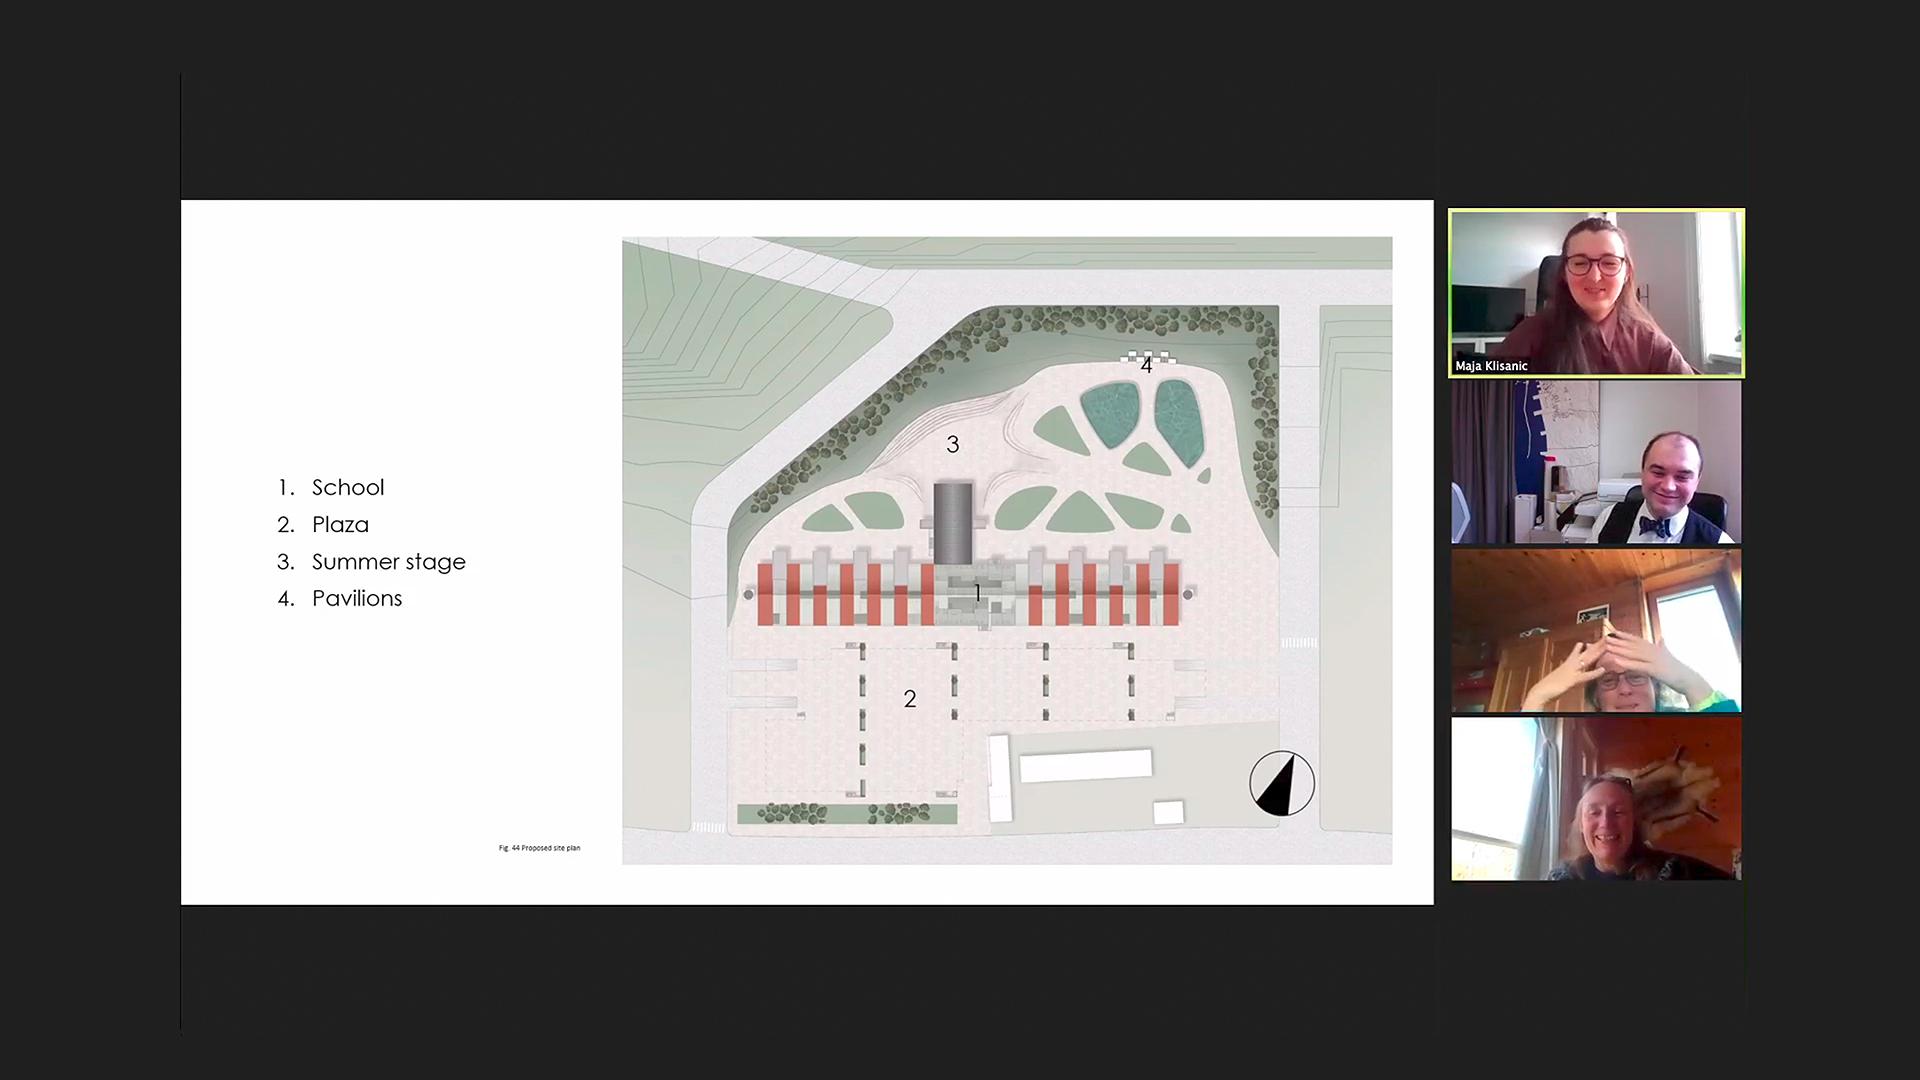 Revitalisation of the Crnomerec brick factory by Maja Klisanic